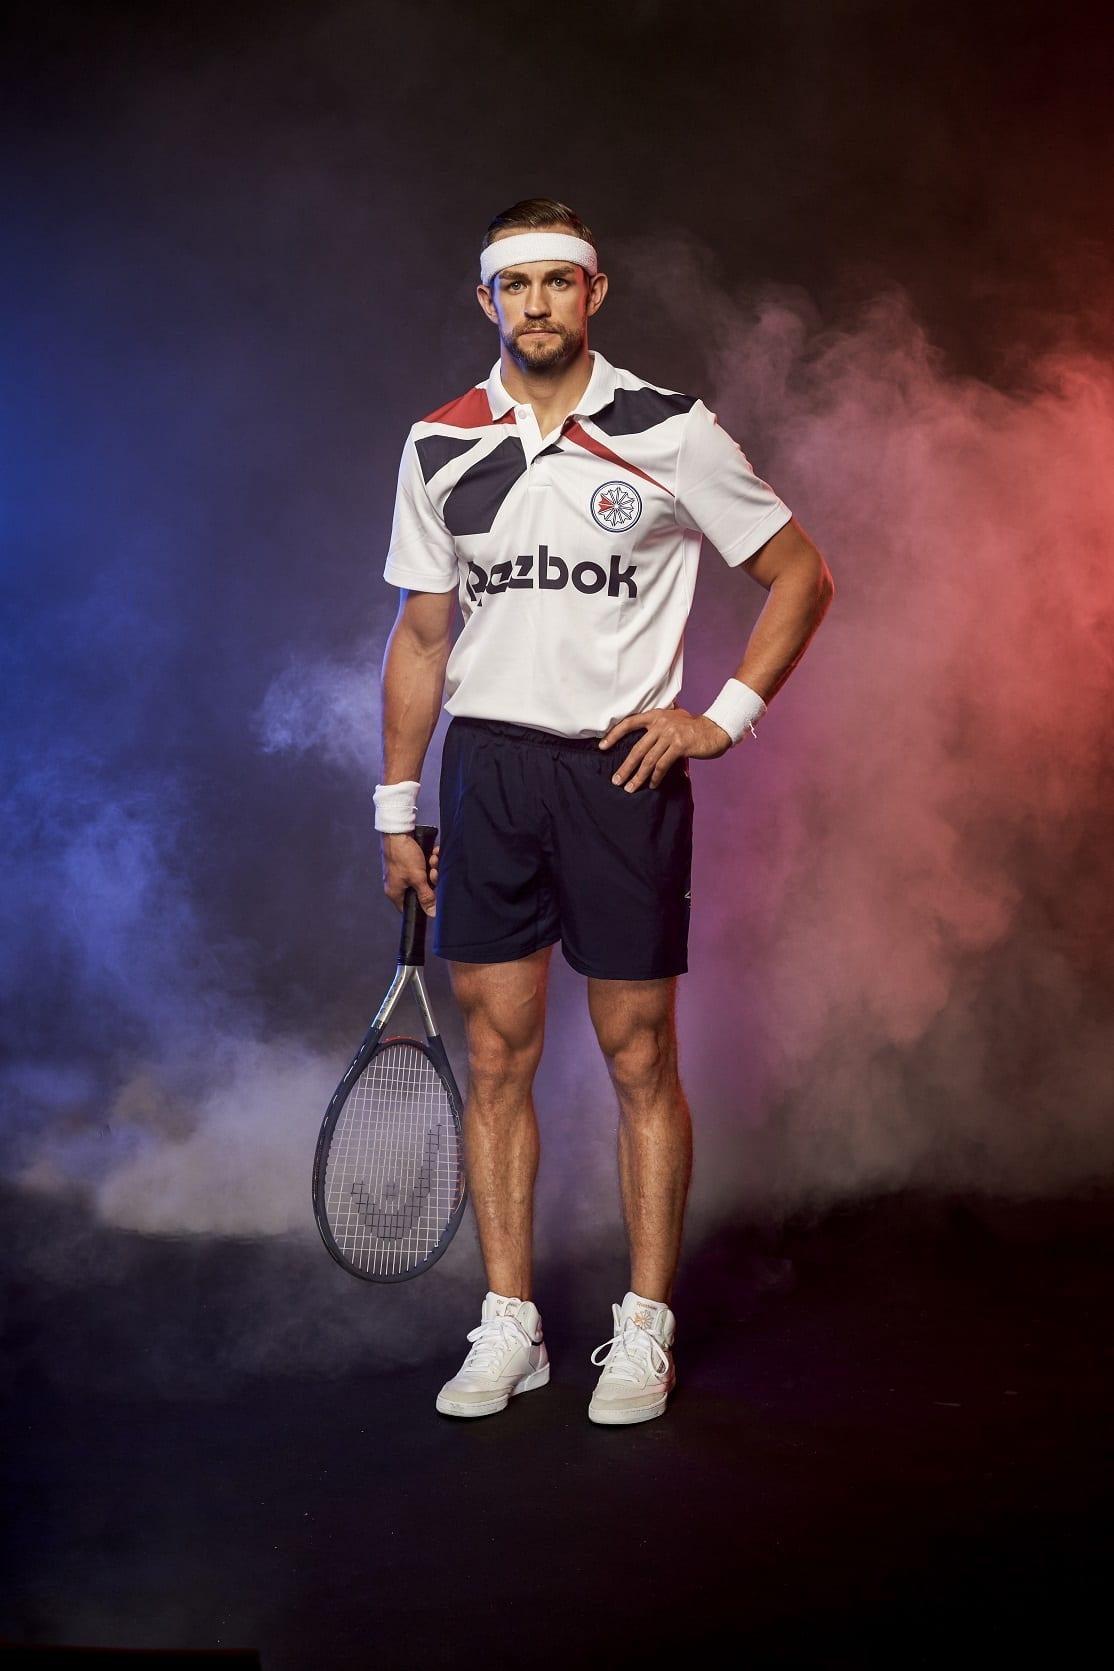 halloween-tennis-player